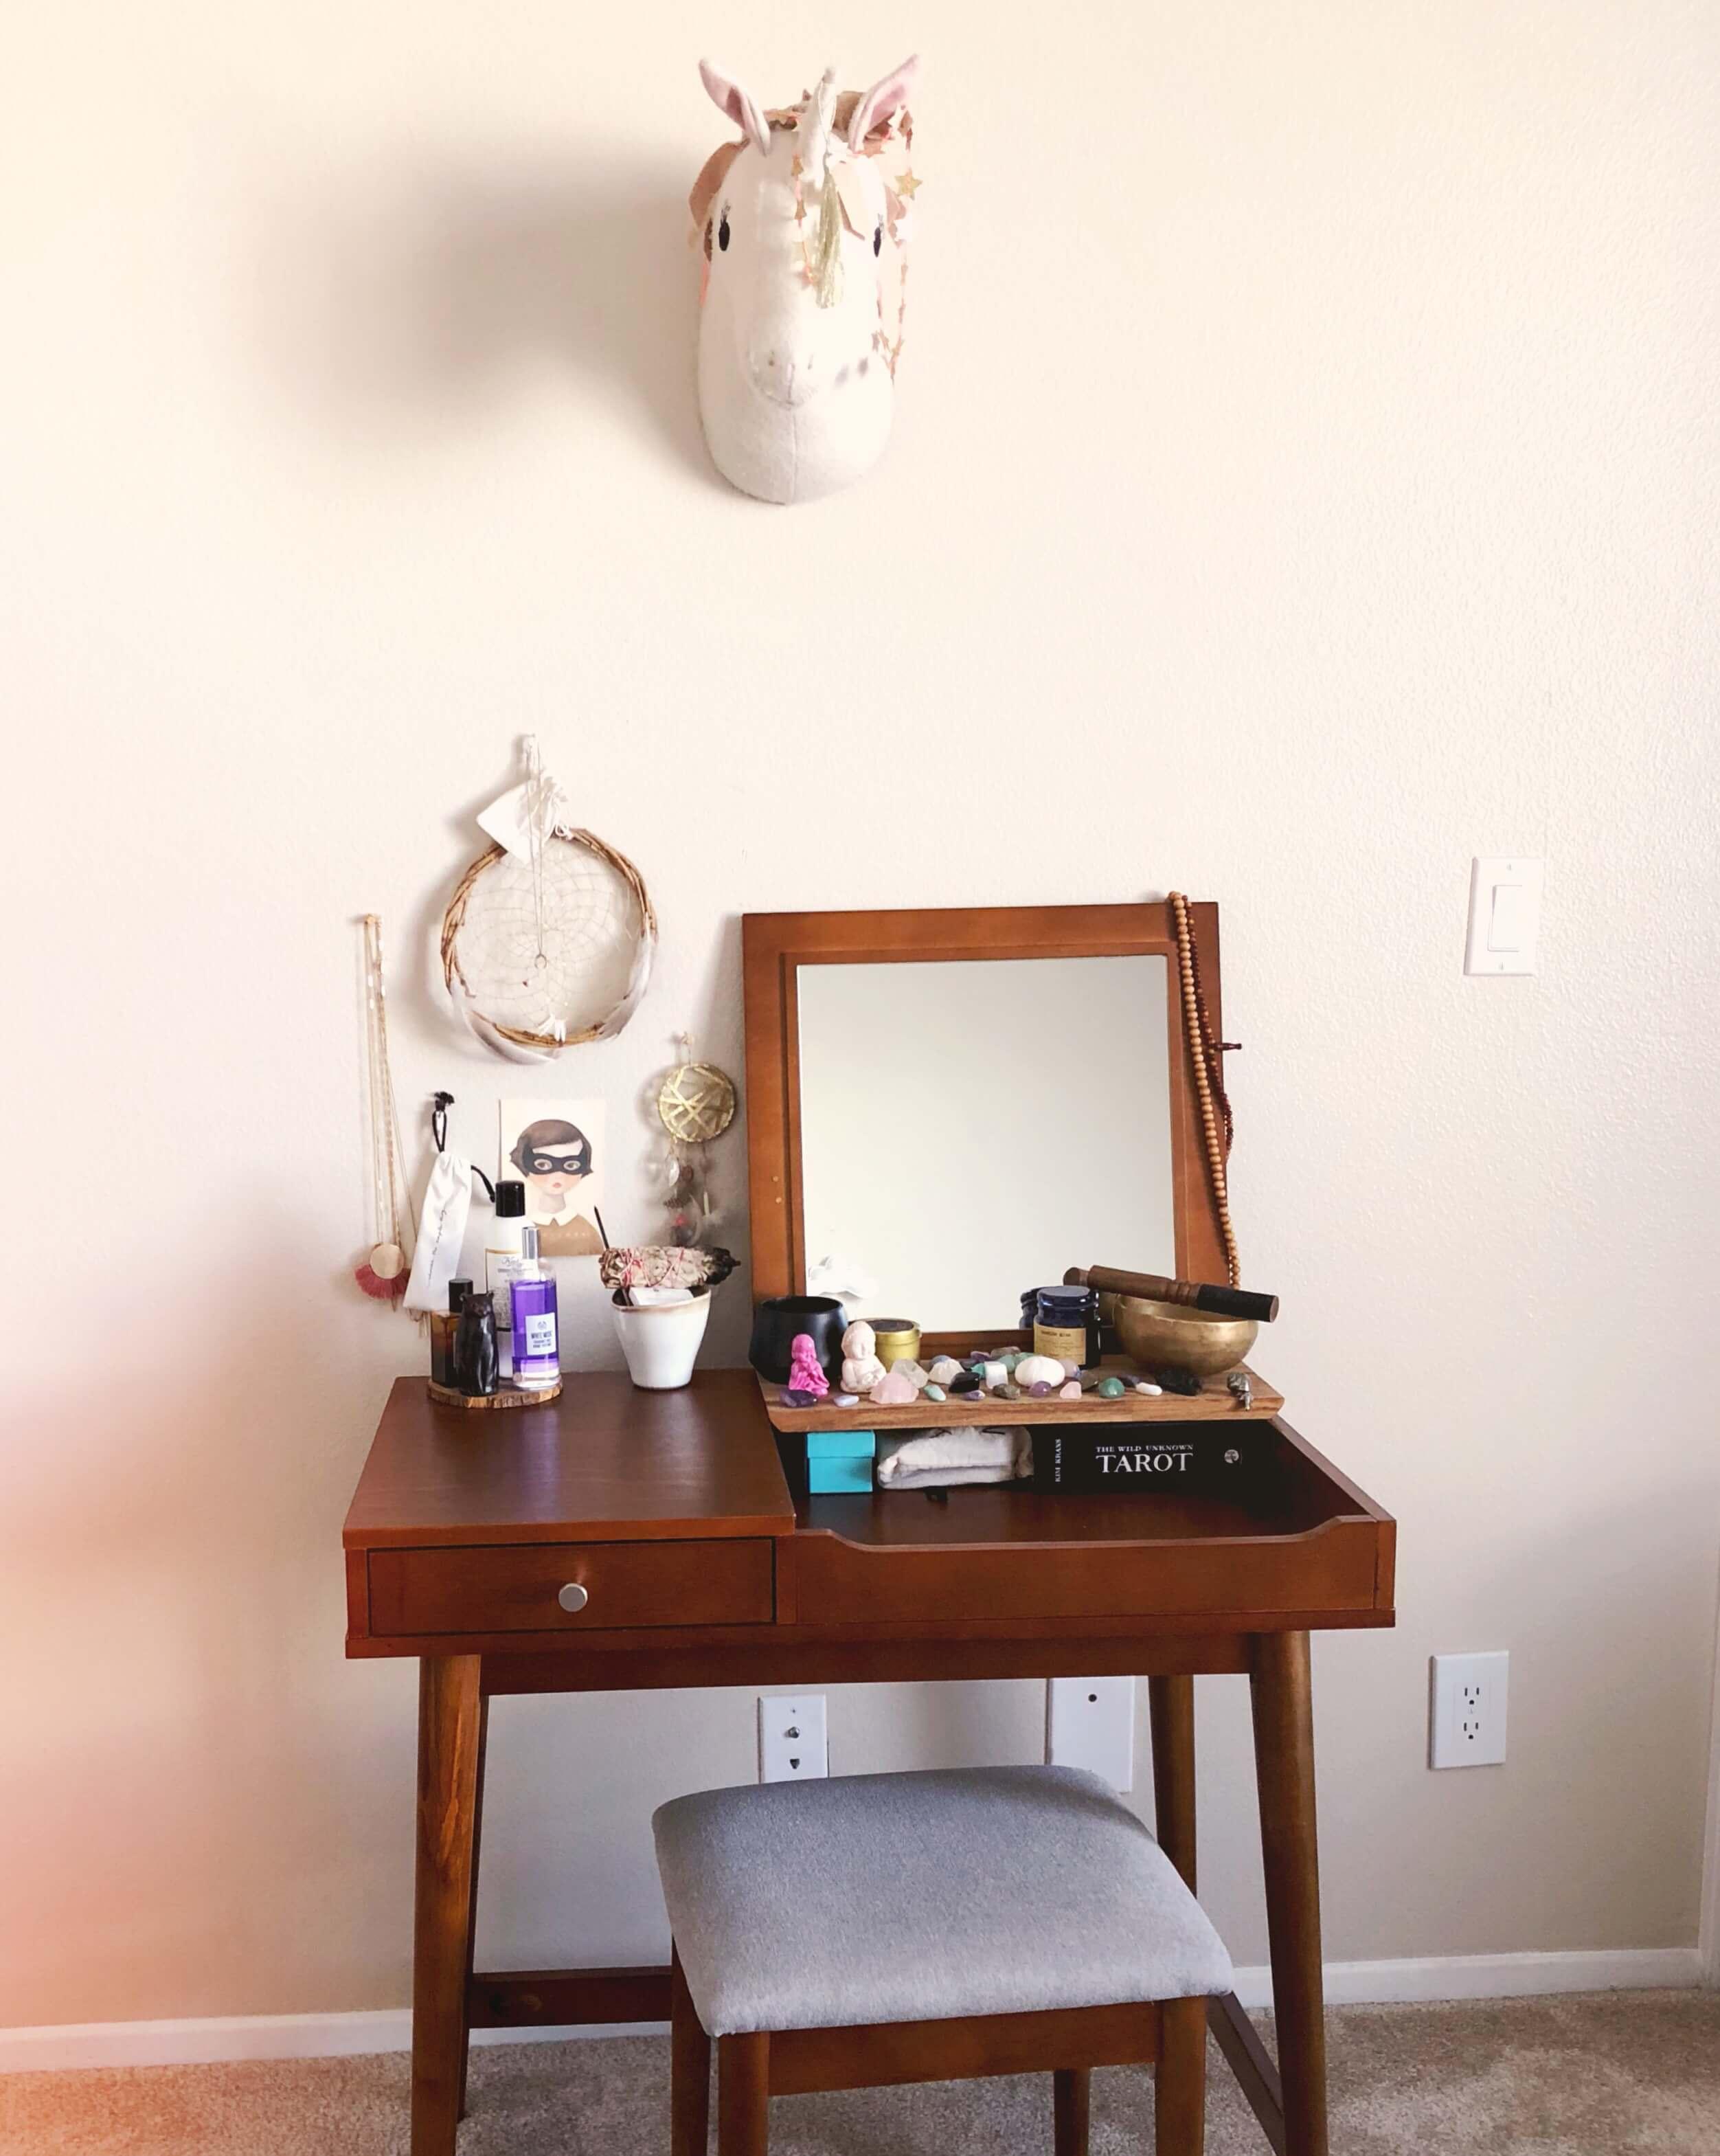 Goodie Mood - Apartment Tour - chambre 2